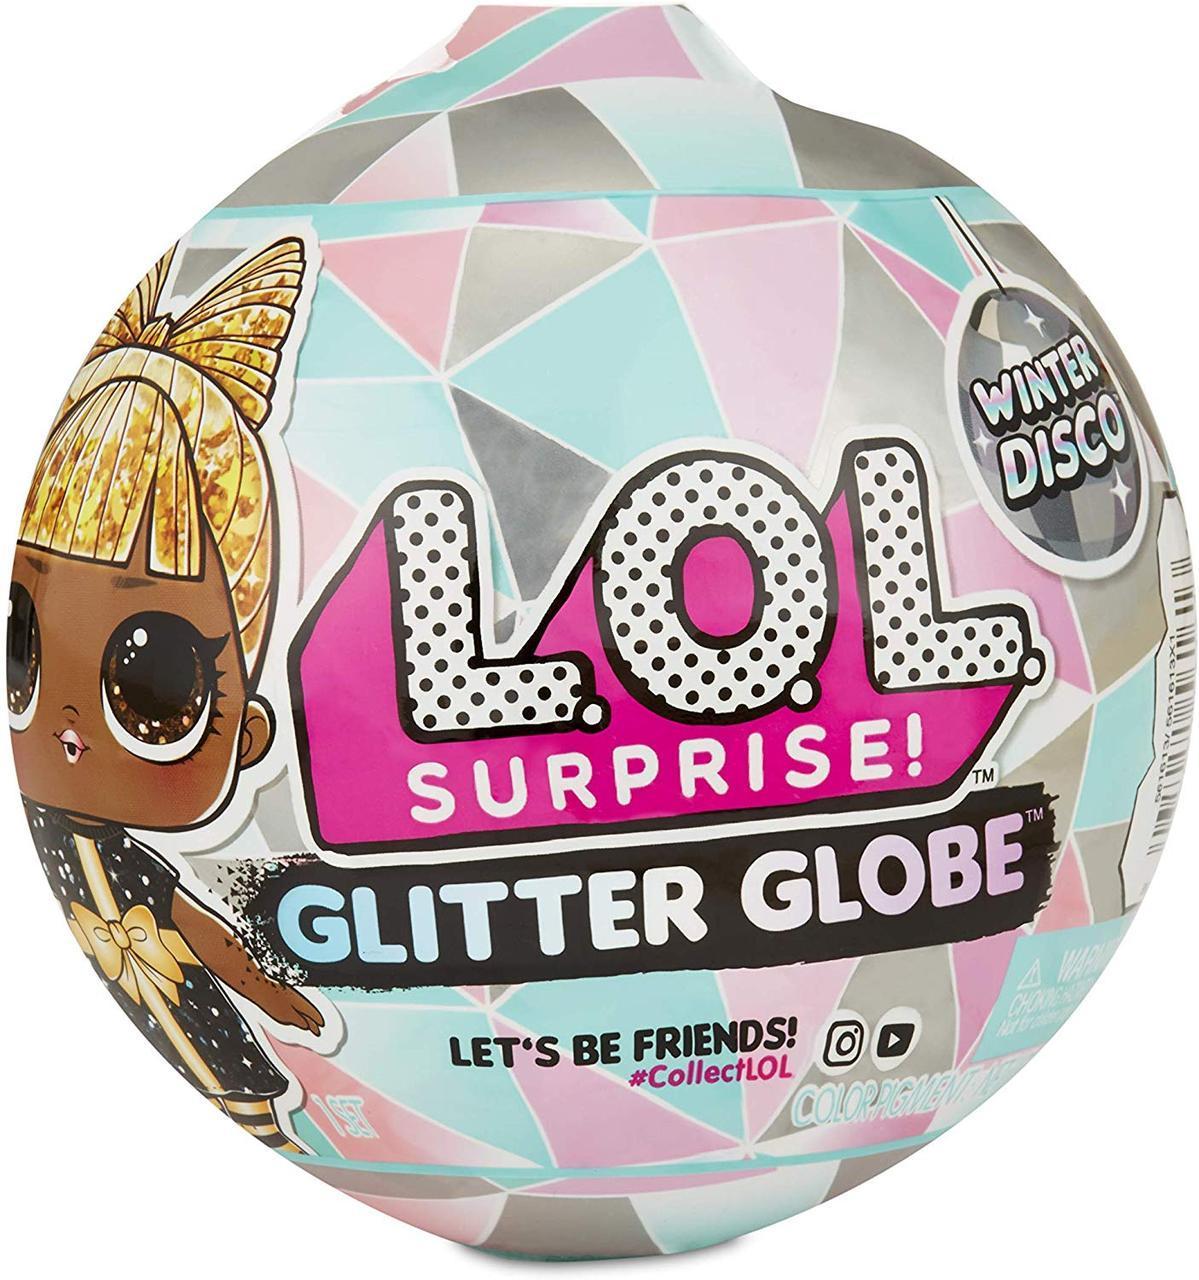 Шарик ЛОЛ сюрприз Блестящая Зимнее Диско  L.O.L. Surprise! Glitter Globe Winter Disco